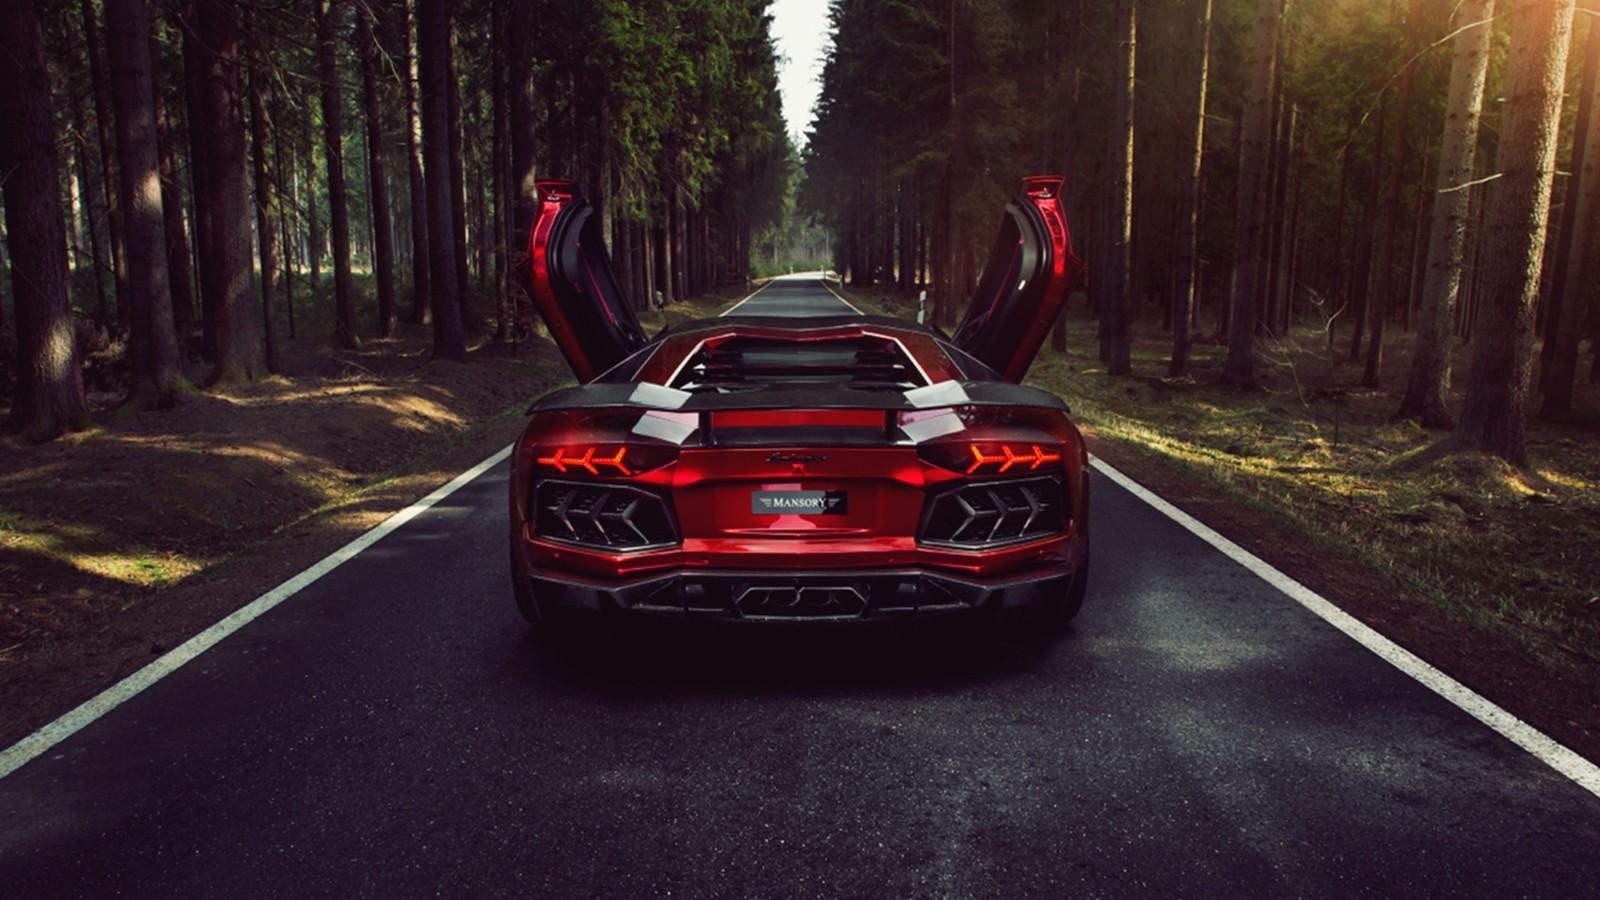 Exotic Cars Hd Wallpapers: Exotic Car Wallpaper HD